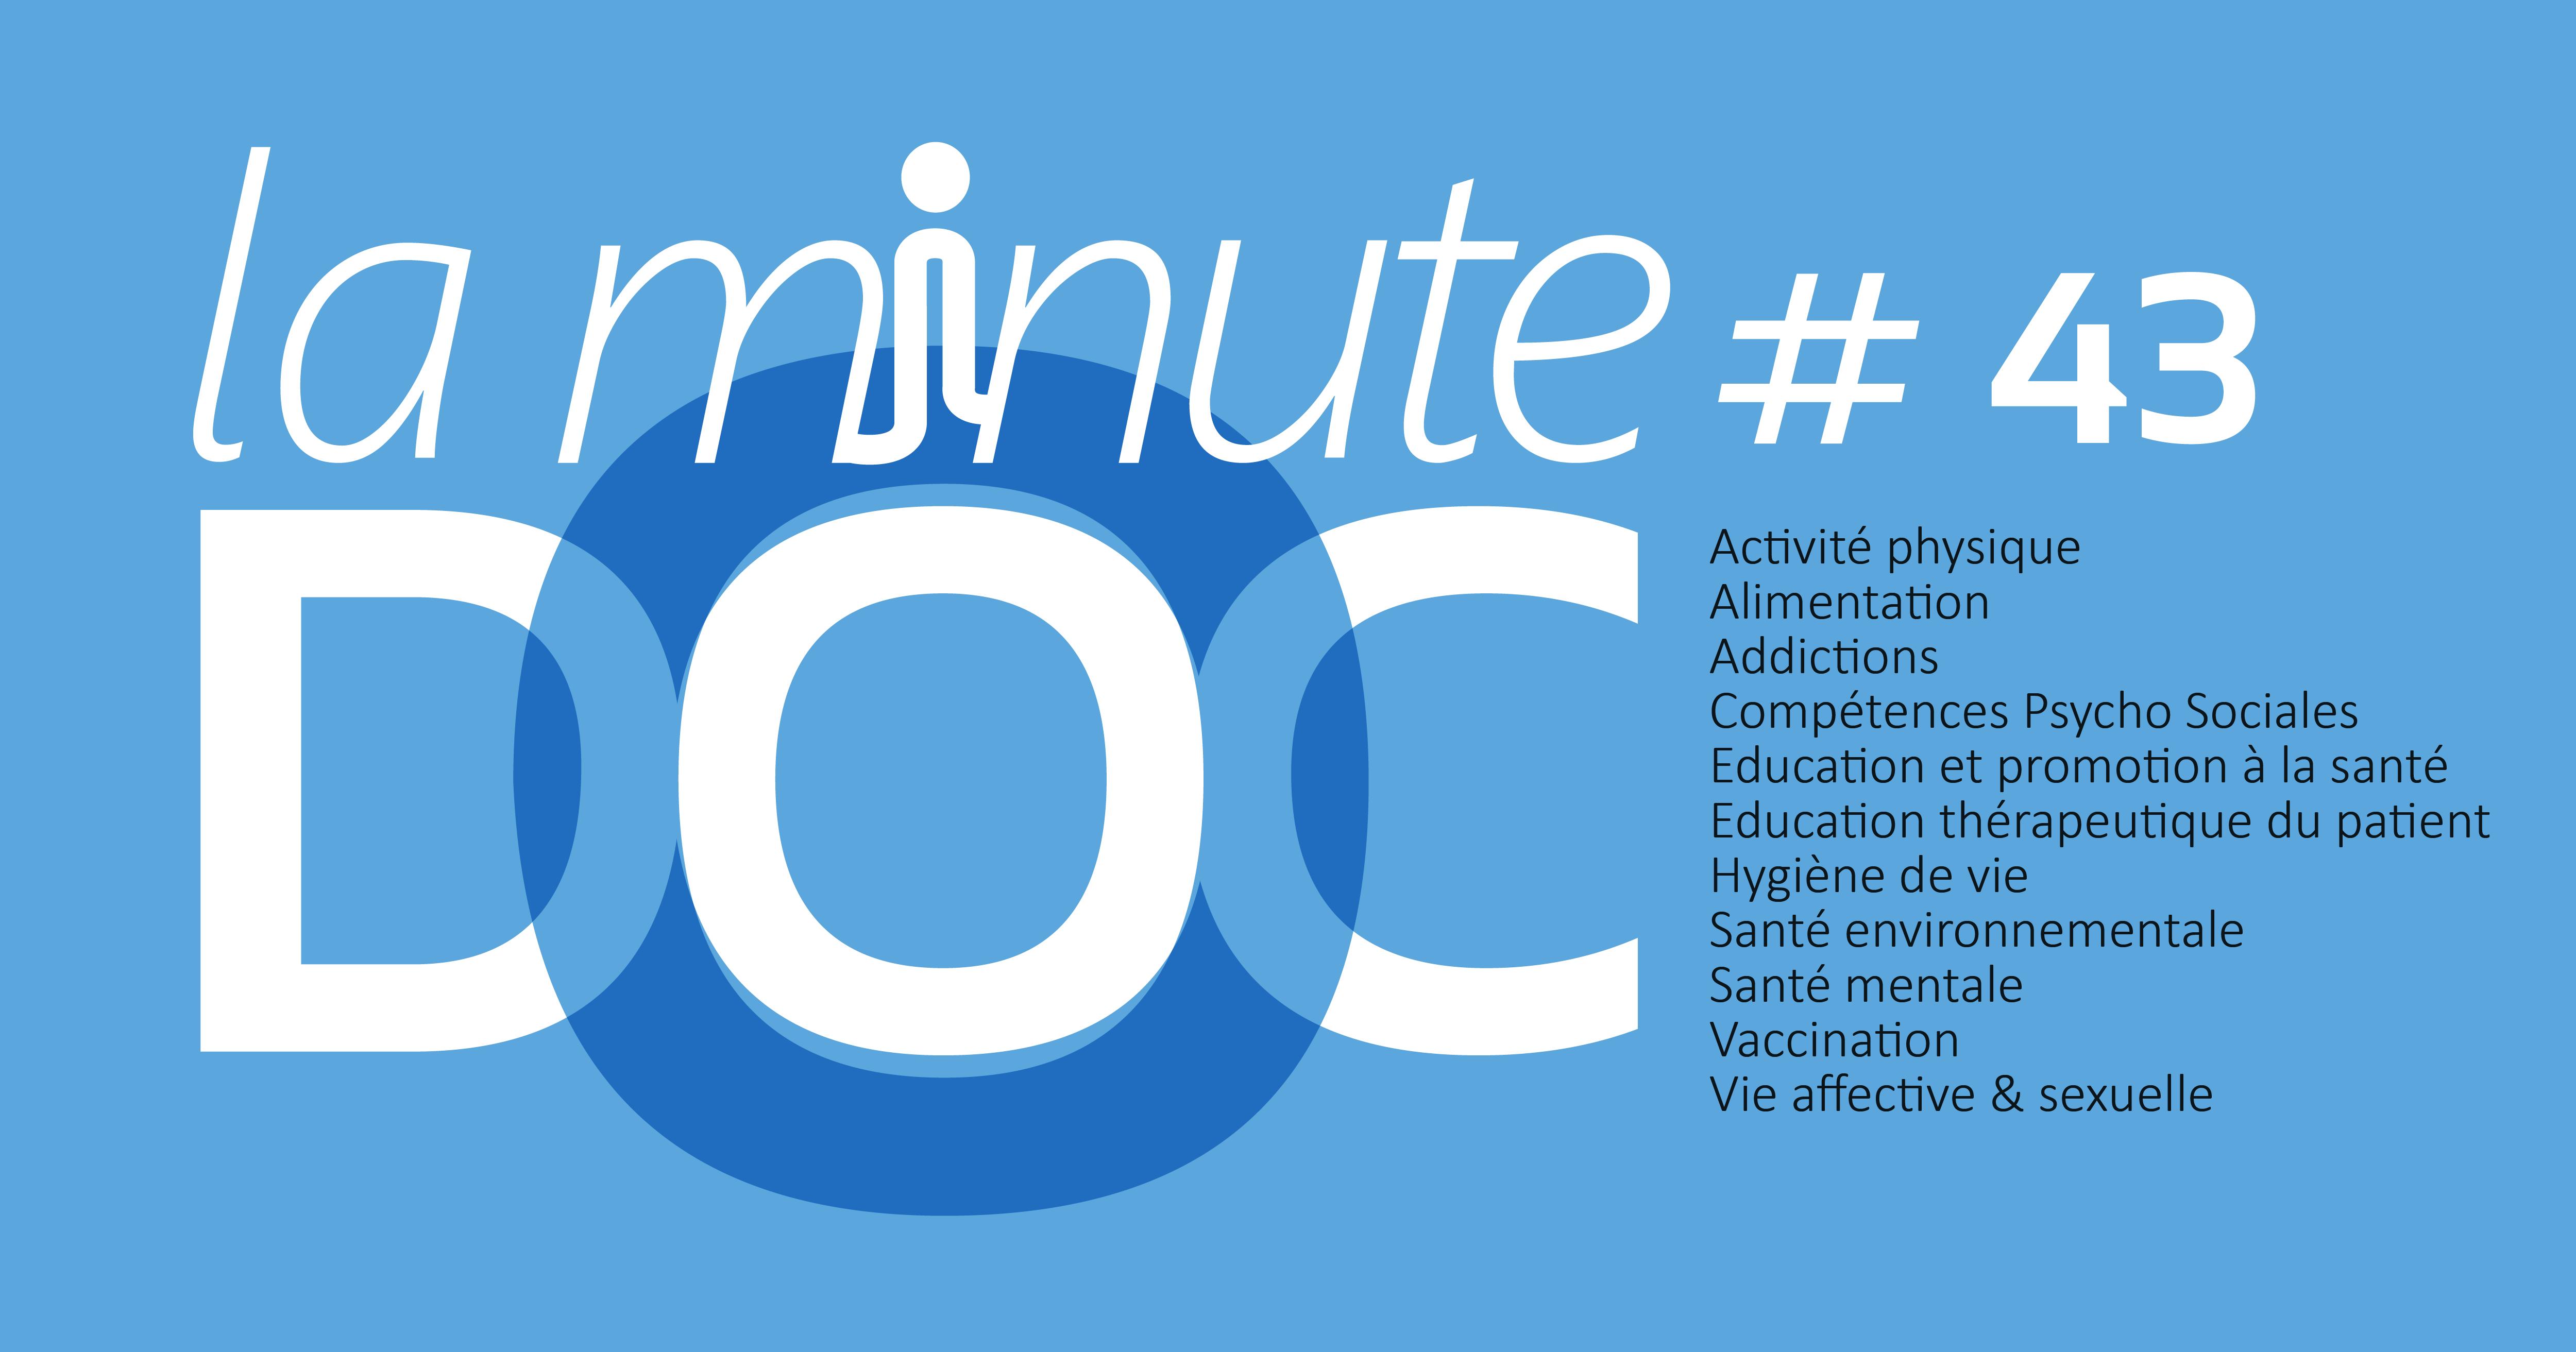 la minute doc 43